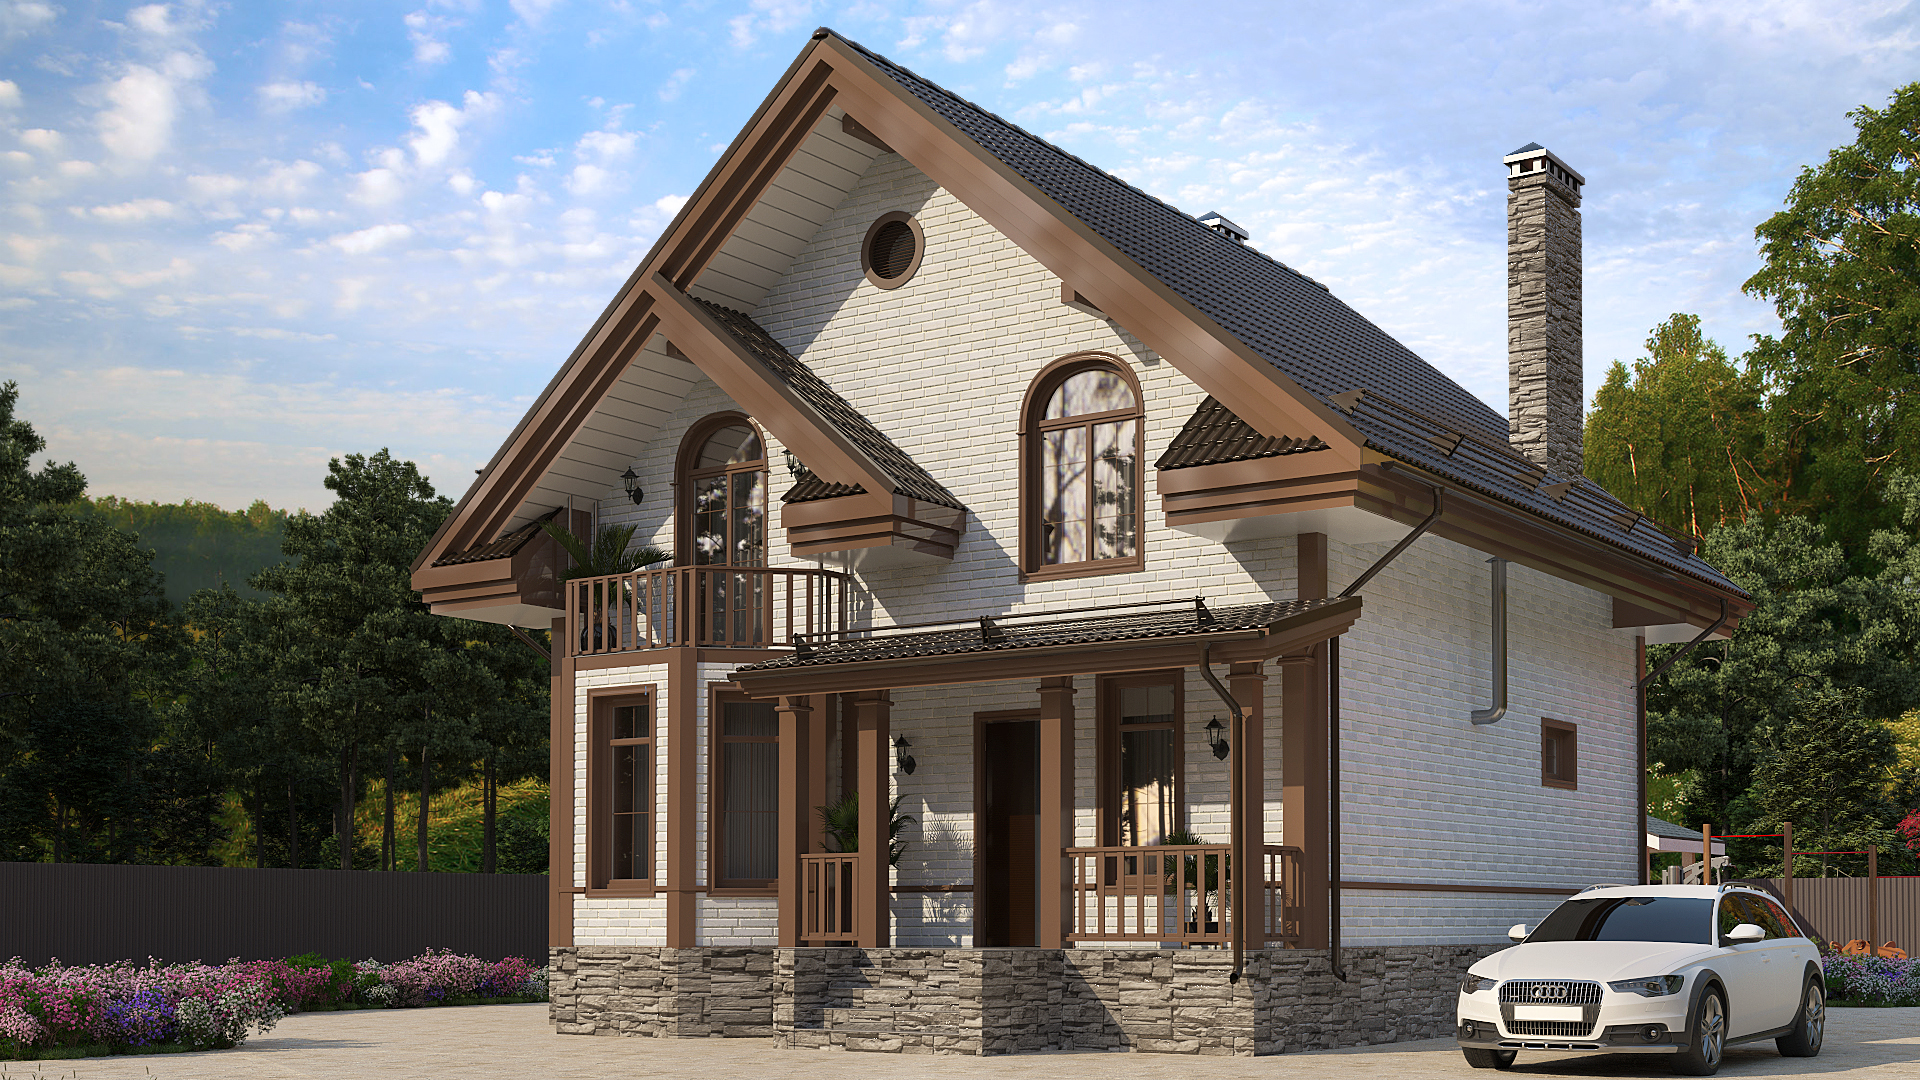 Готовый проект коттеджа 110 кв. м / Артикул amZ-85 фасад